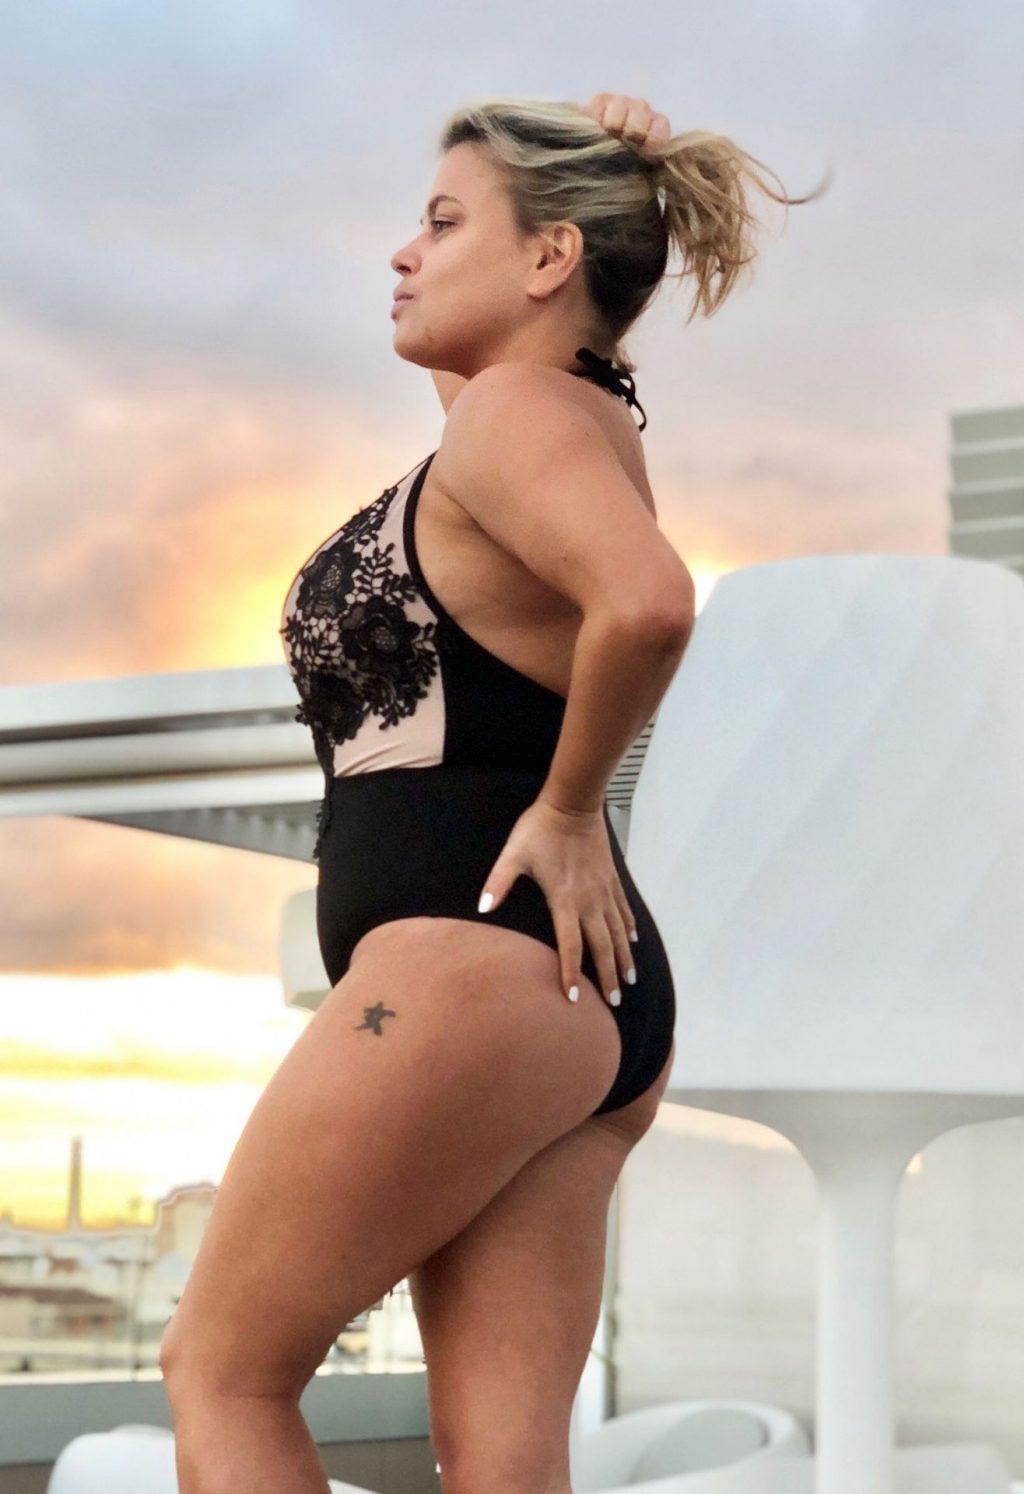 Alice Sey boobs. 2018-2019 celebrityes photos leaks! naked (42 photo), Paparazzi Celebrity photos